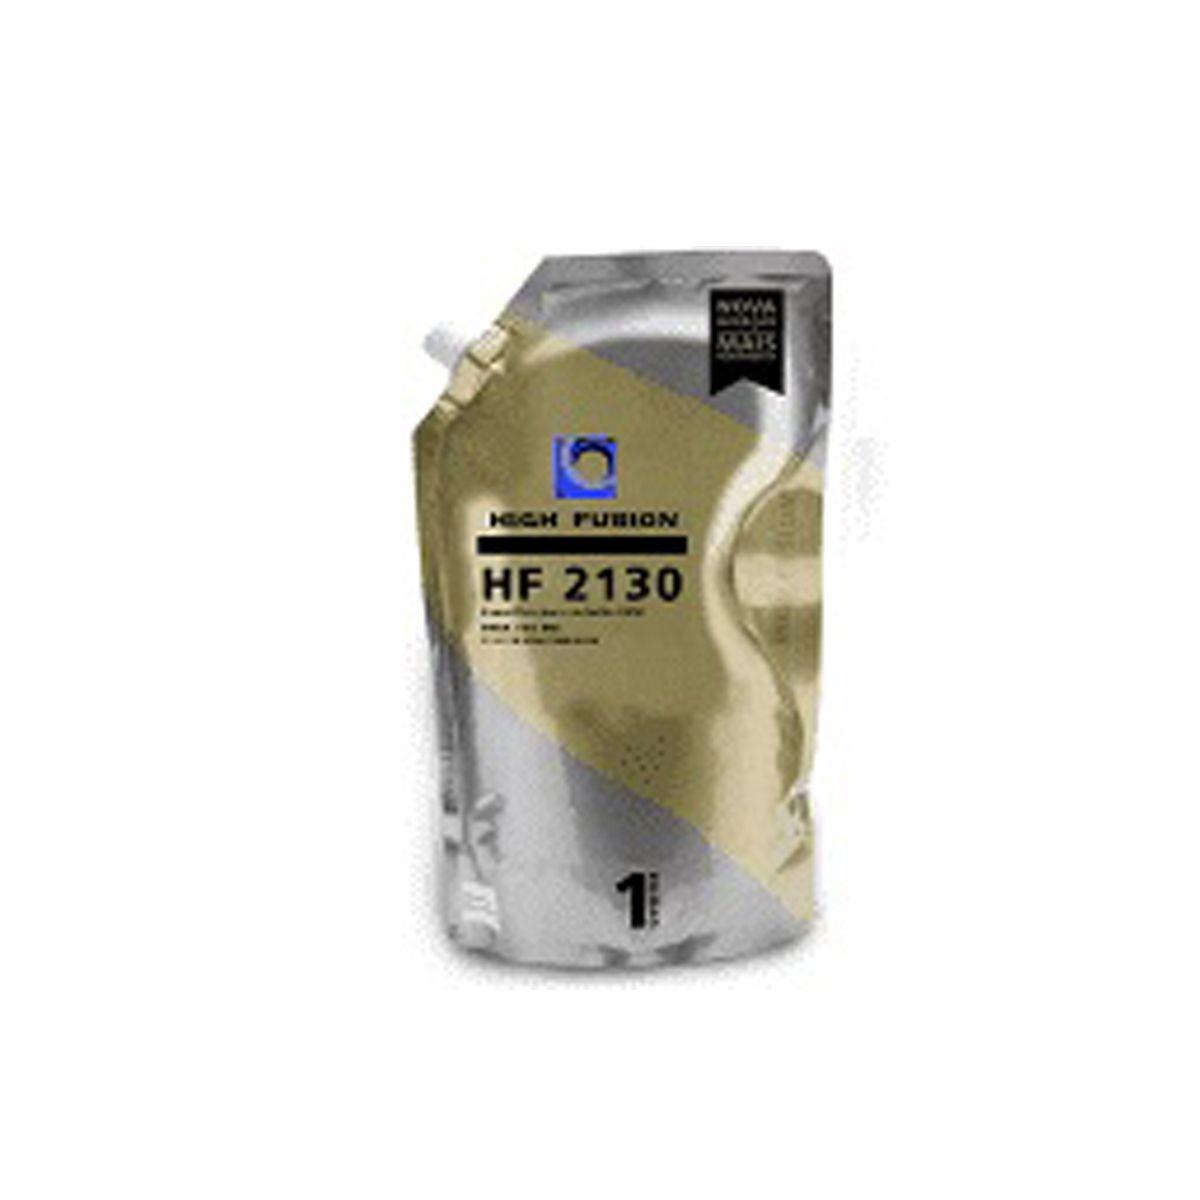 Po Toner HP High Fusion - CF217 CF218 Cf230 CF233 - M130 M102 M130FW M102W M132NW M132FN - 1 kg